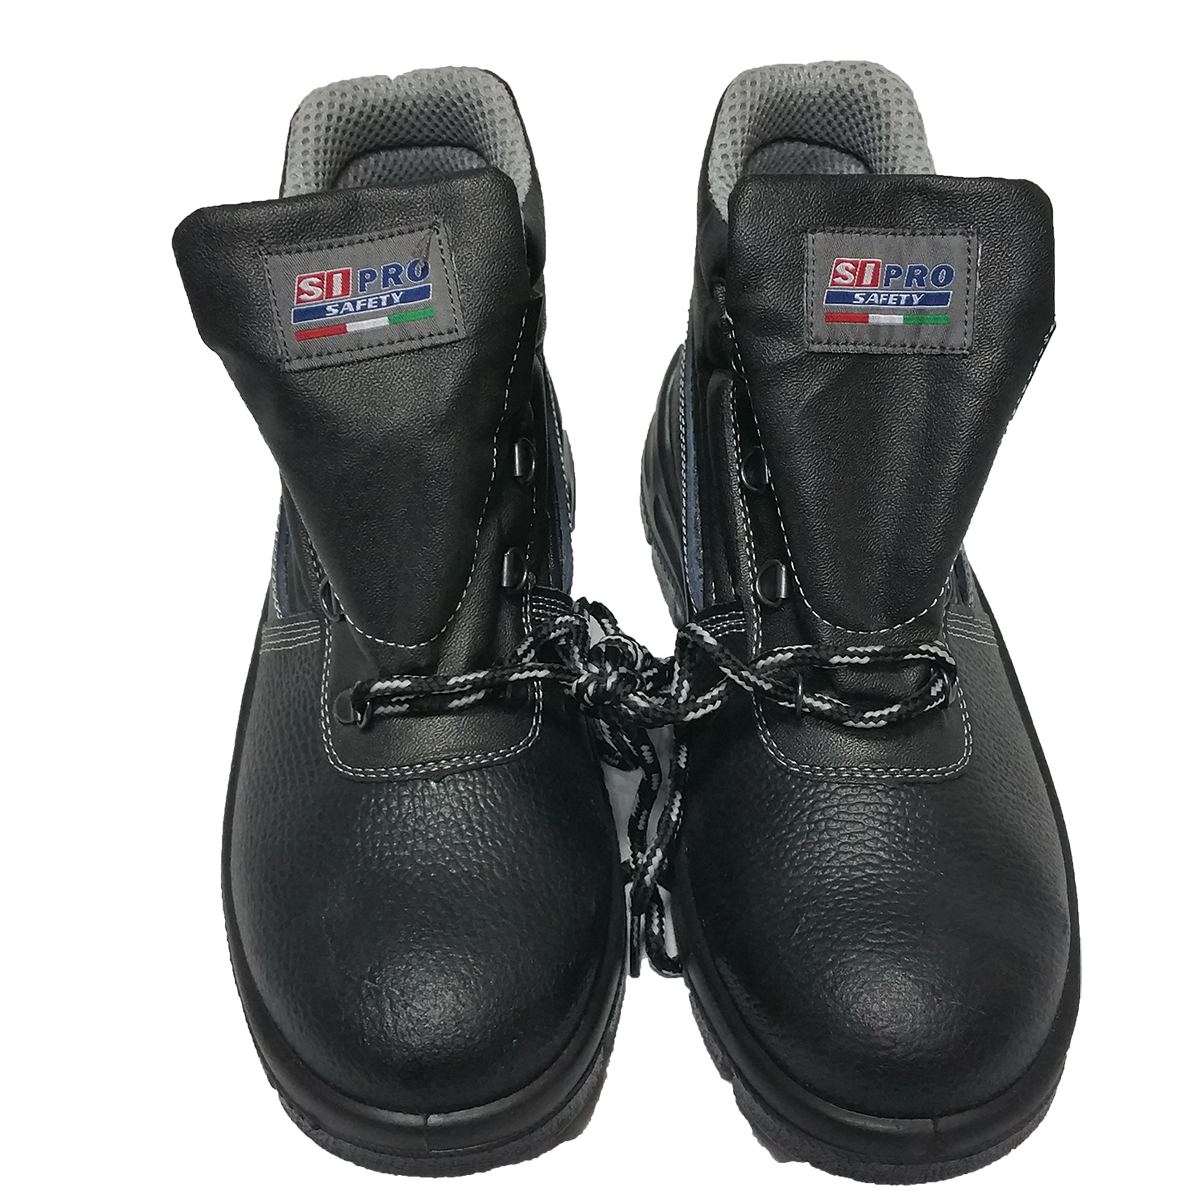 Cipela radna SI PRO SAFETY